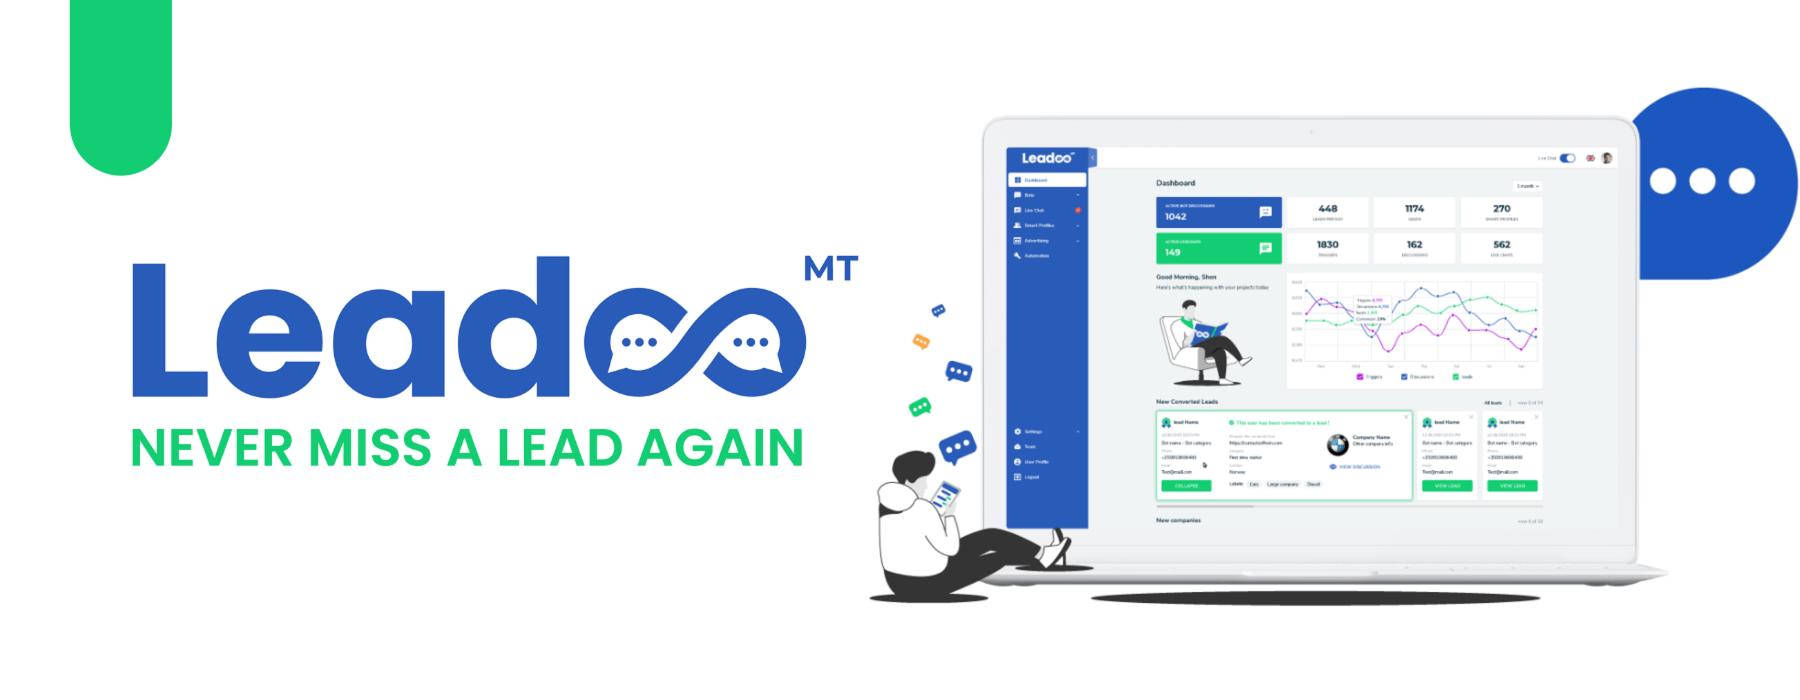 Leadoo Marketing Technologies